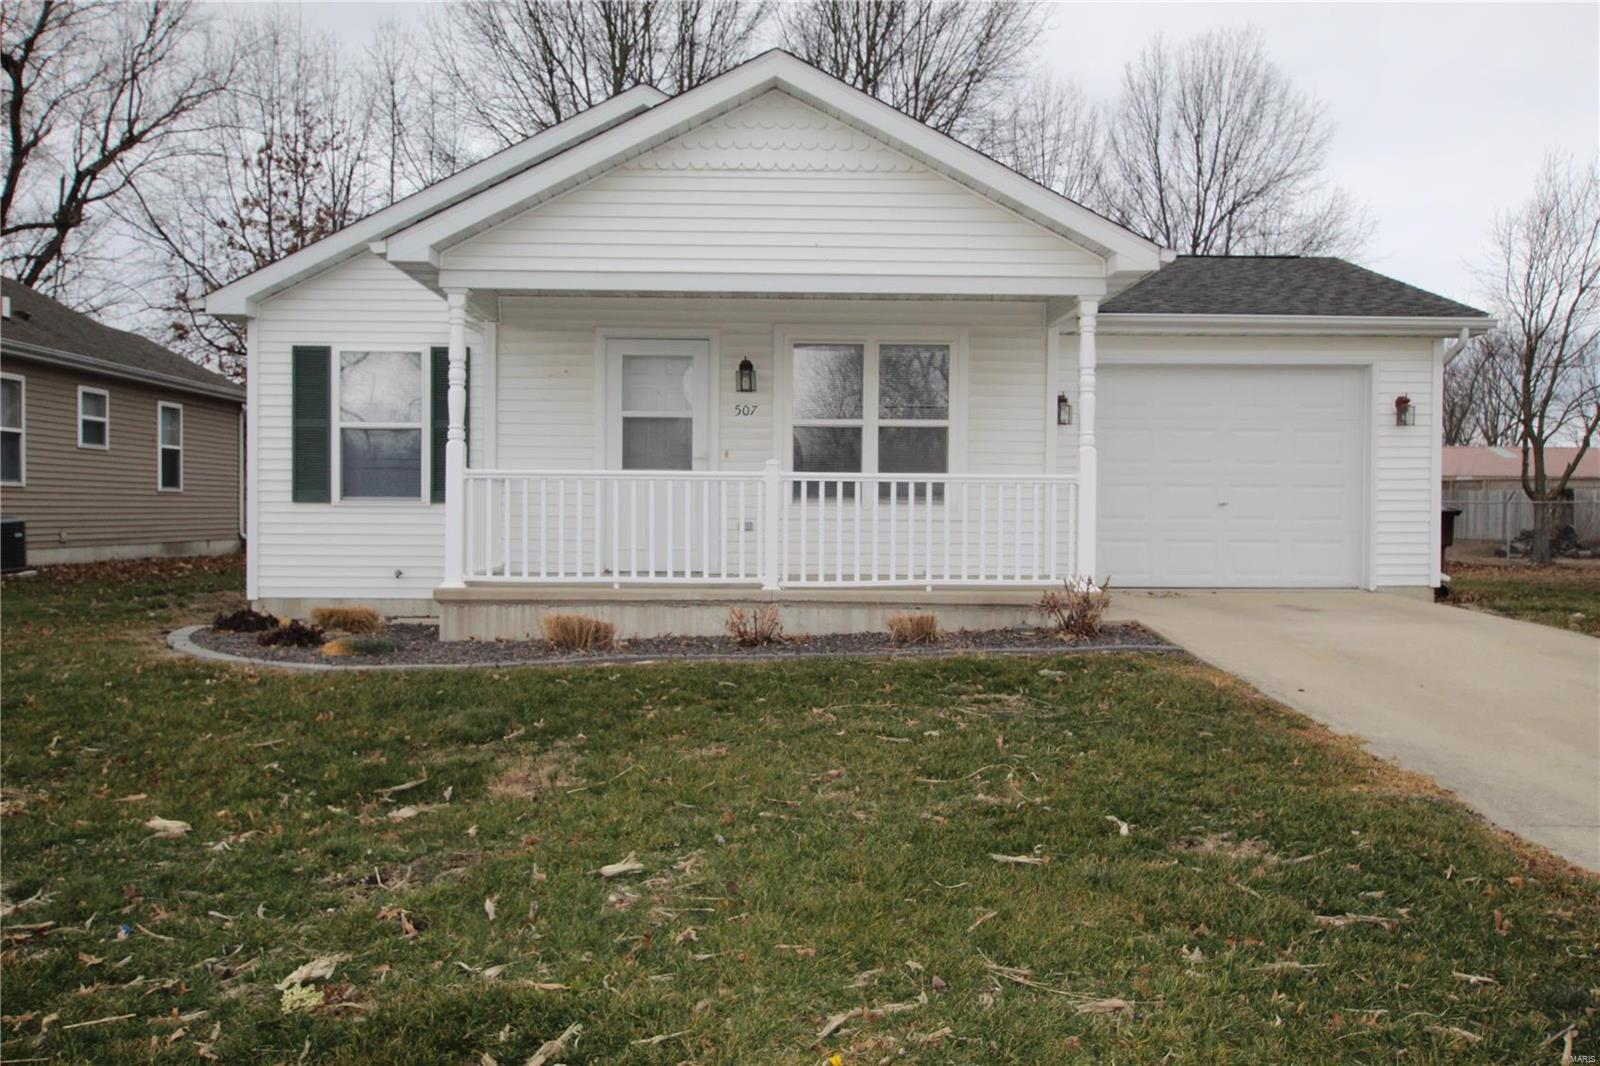 507 ARLINGTON Property Photo - Taylorville, IL real estate listing